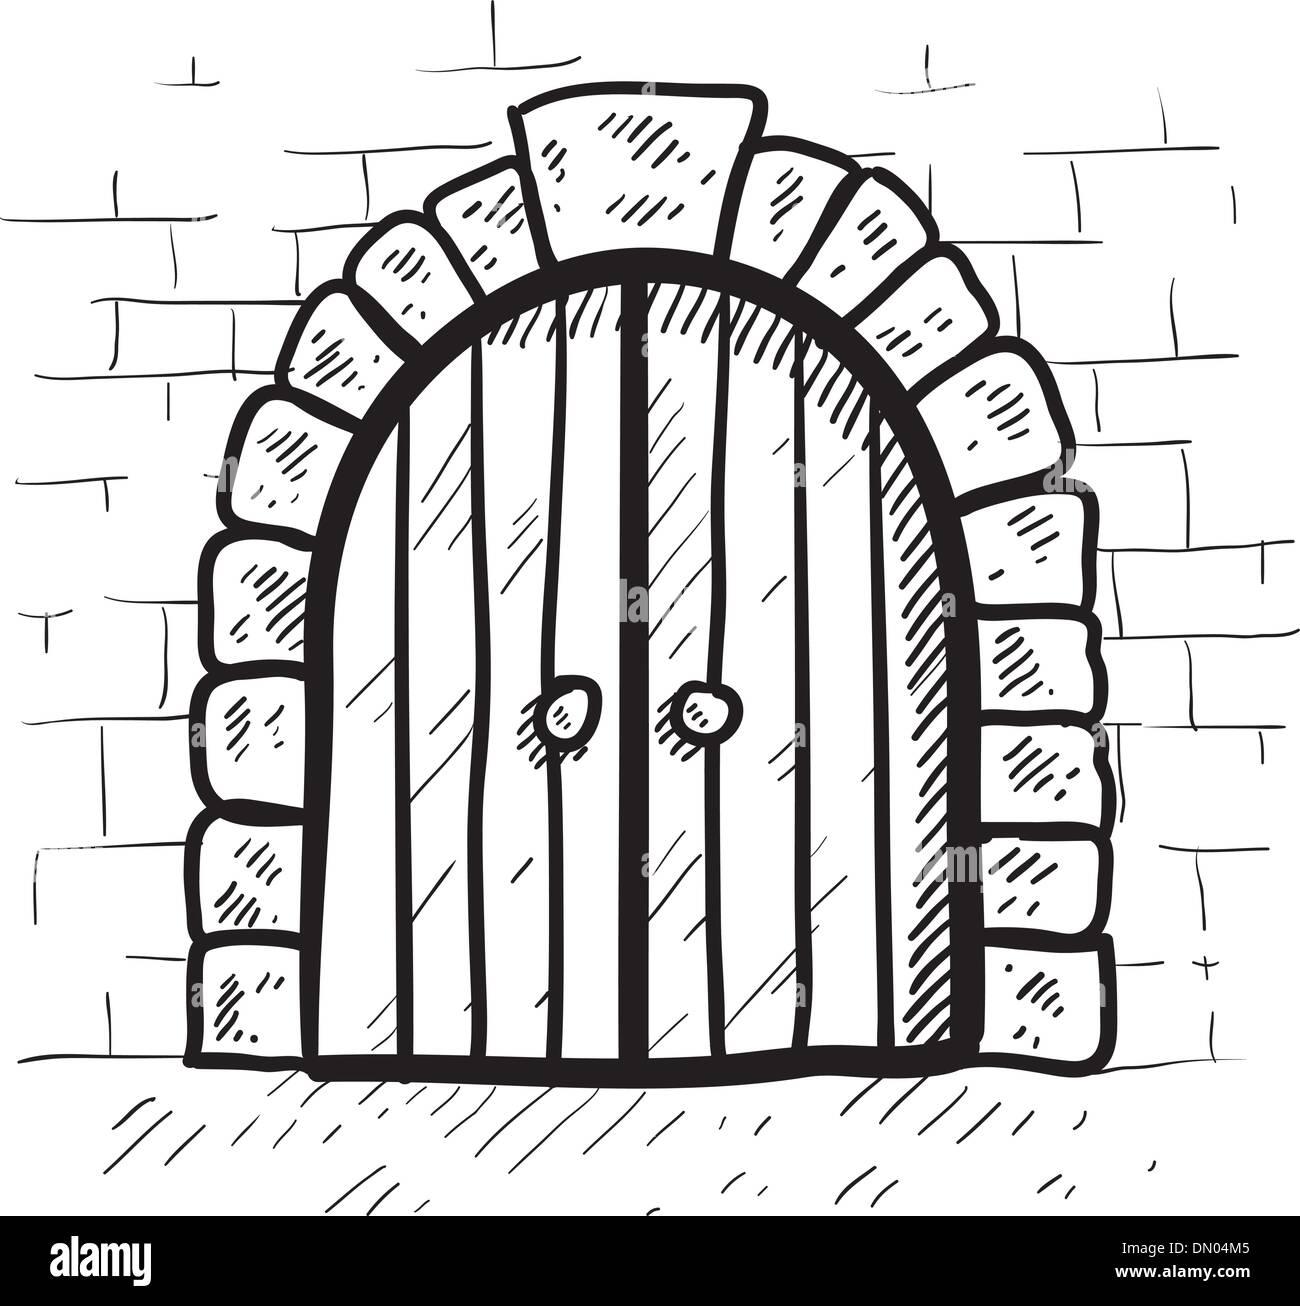 Secure castle door vector sketch  sc 1 st  Alamy & Secure castle door vector sketch Stock Vector Art u0026 Illustration ...